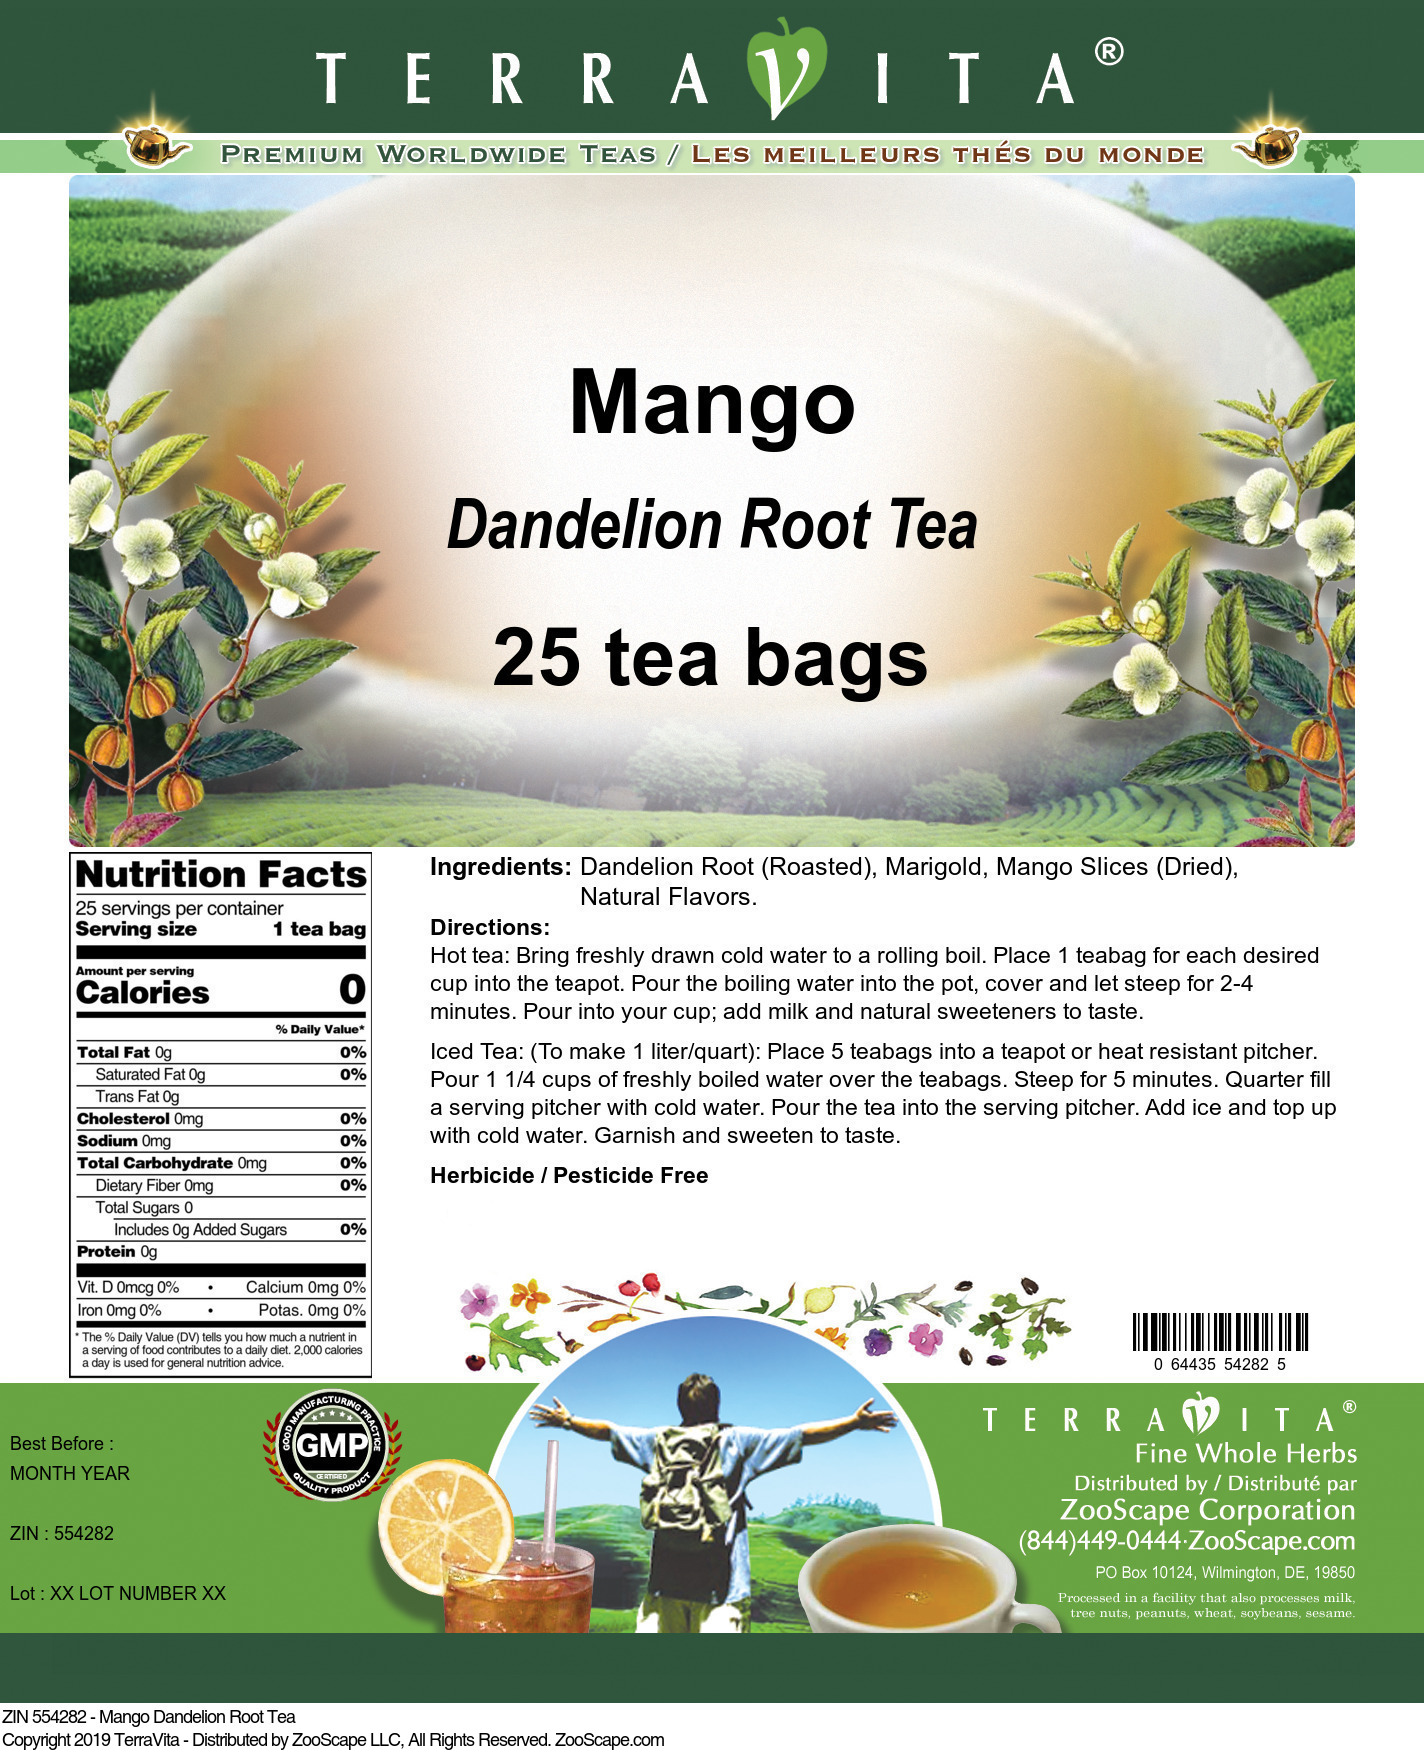 Mango Dandelion Root Tea